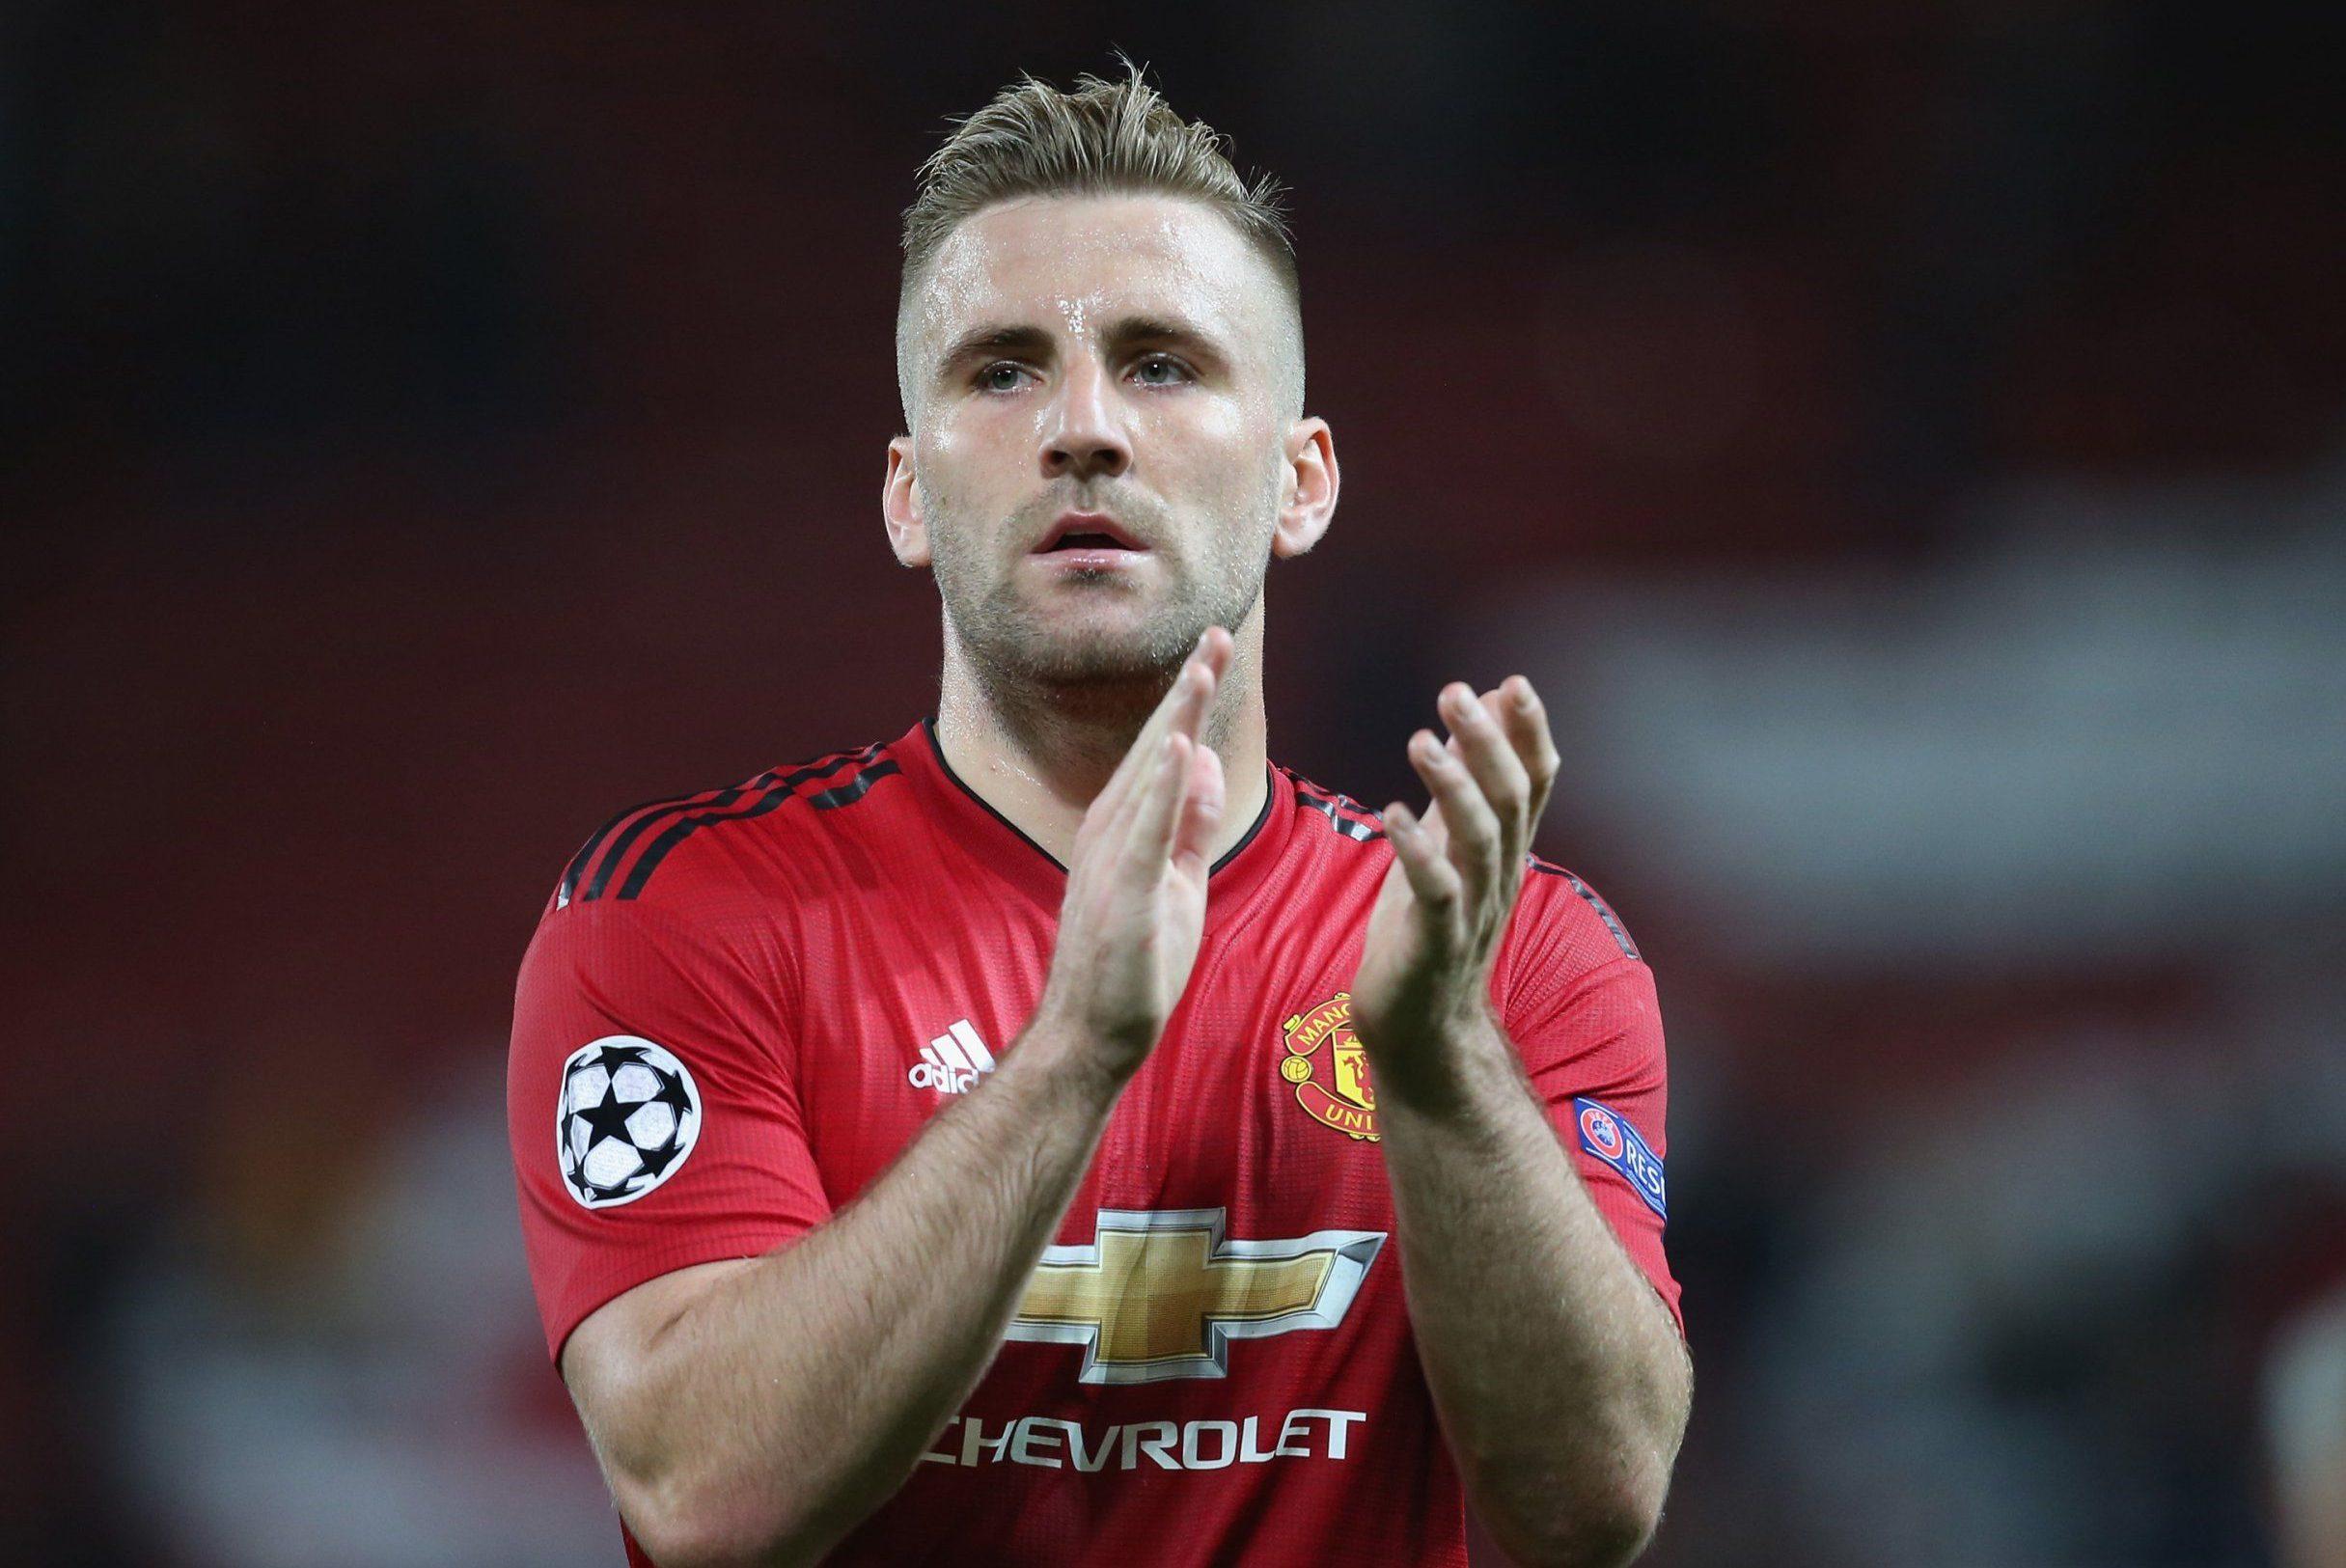 Luke Shaw thanks Ole Gunnar Solskjaer for reintroducing 'attacking' football at Manchester United